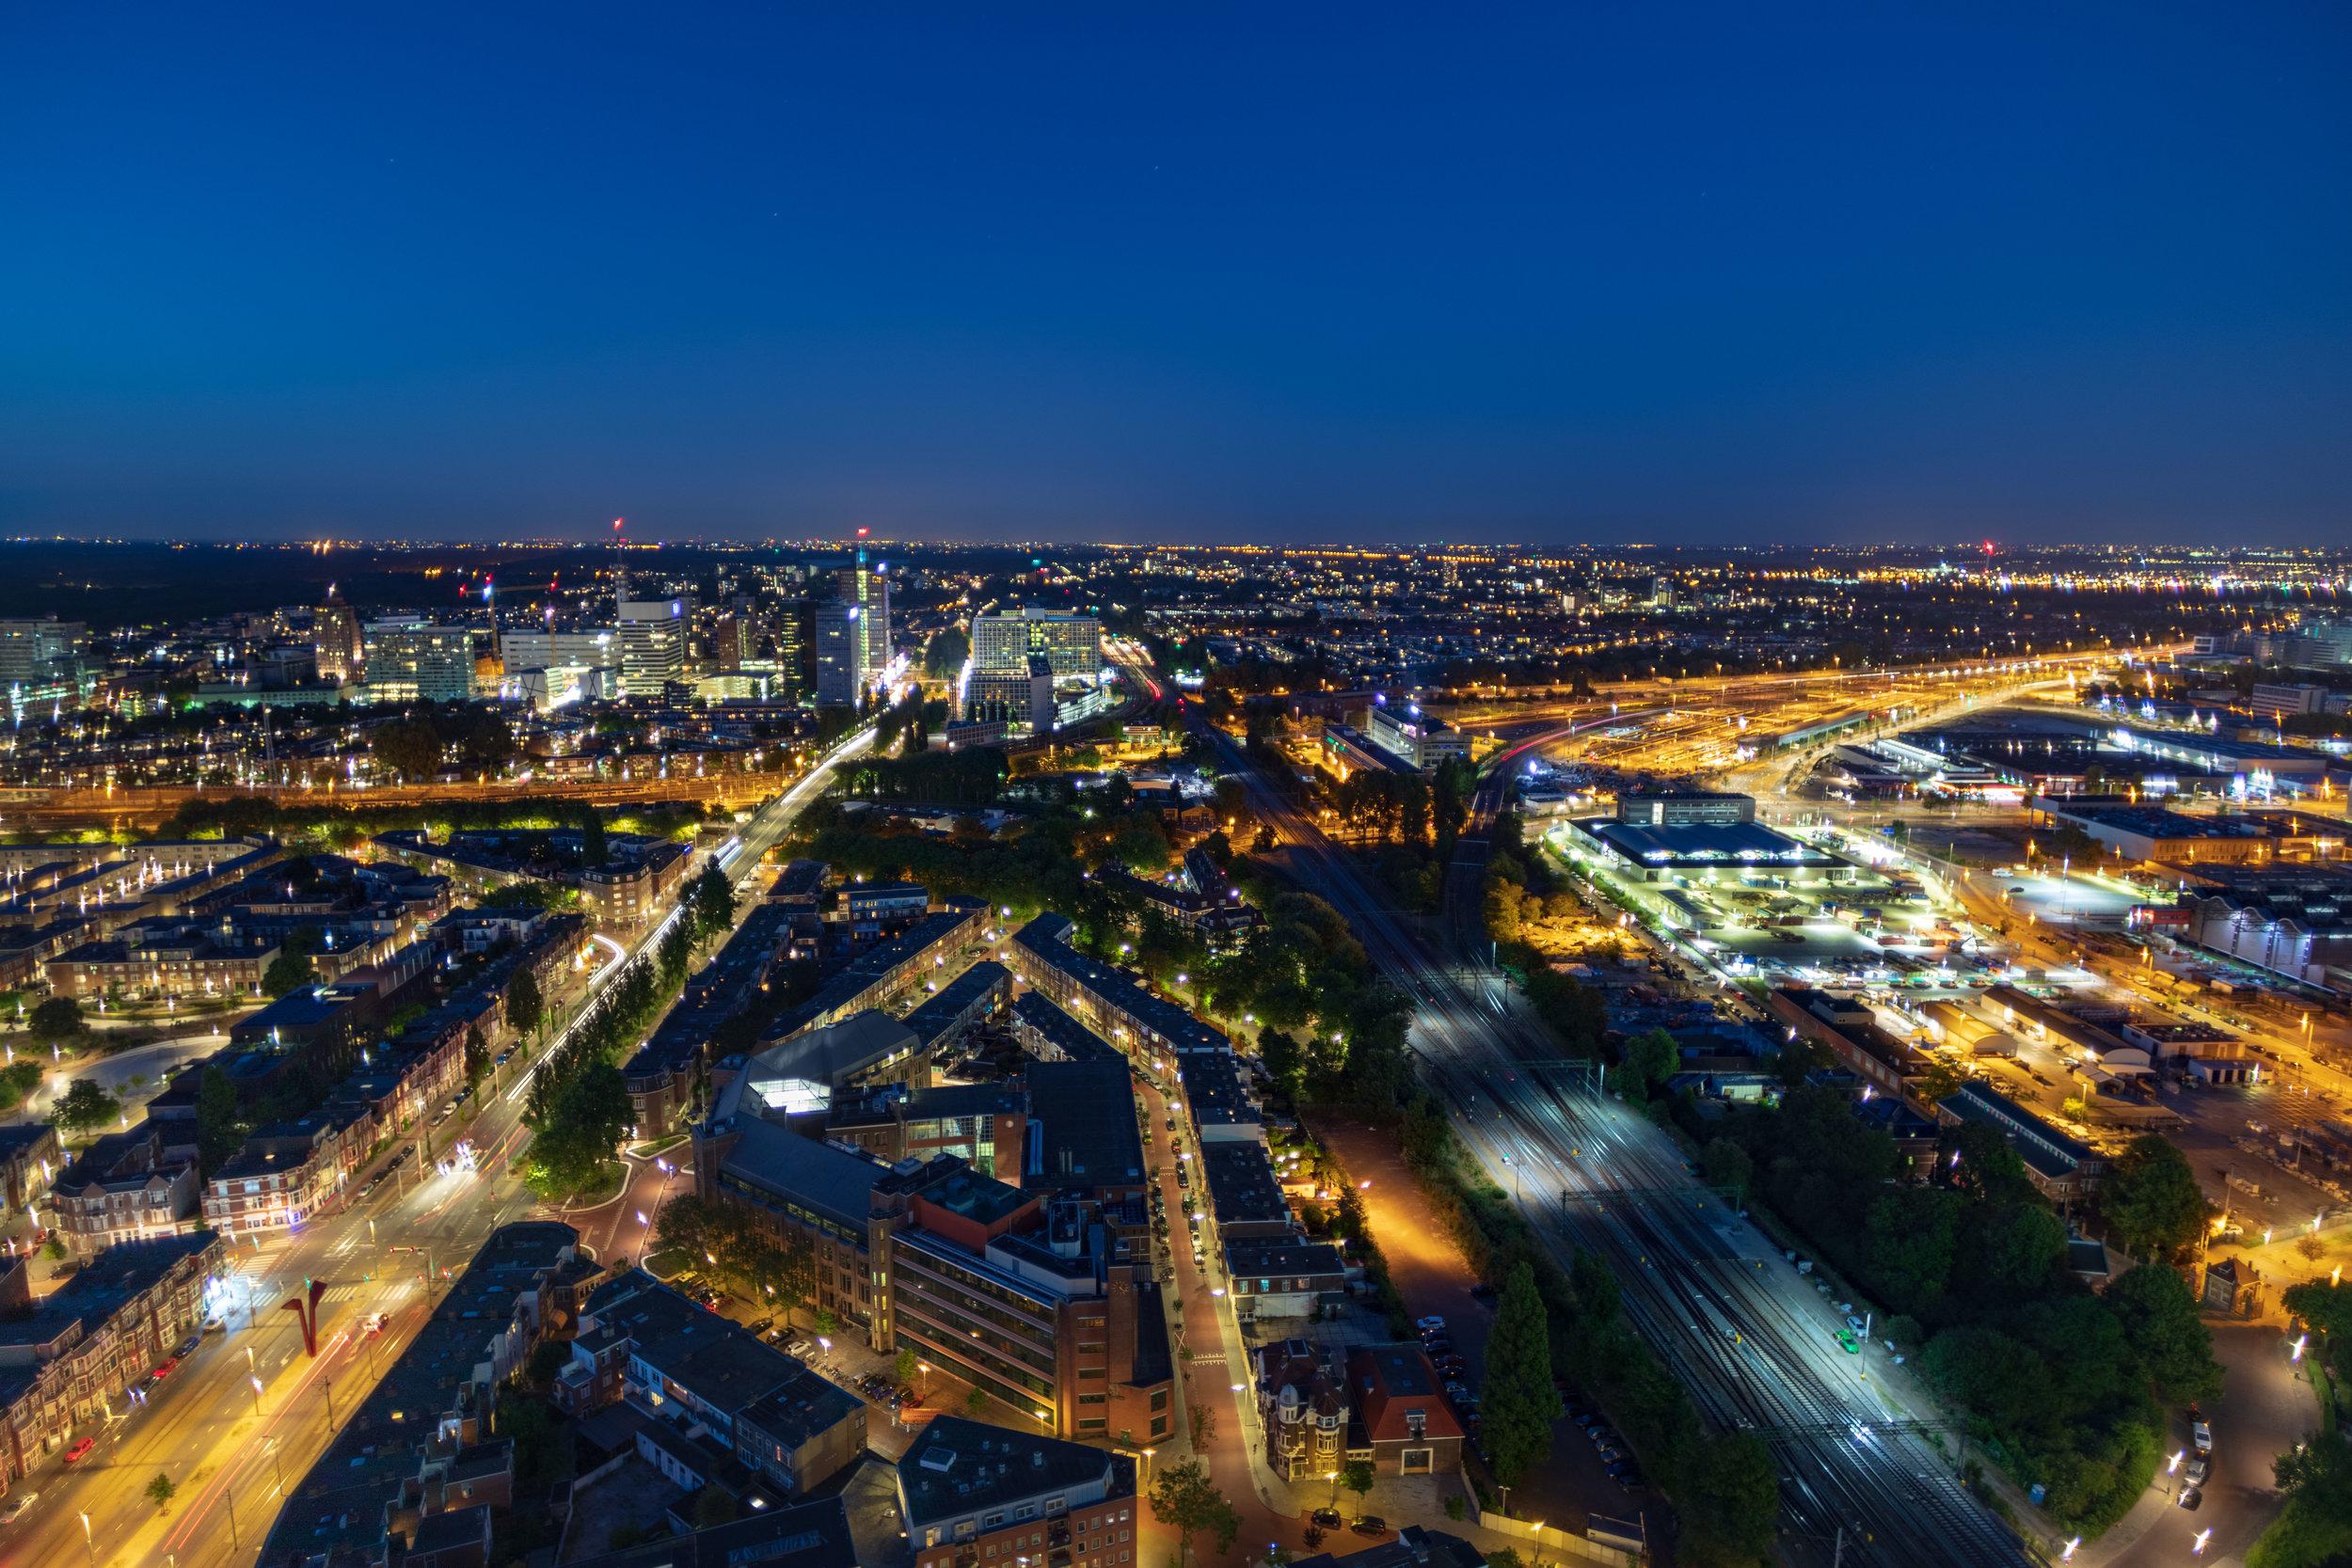 Den Haag Sky view | The Hague Sky view